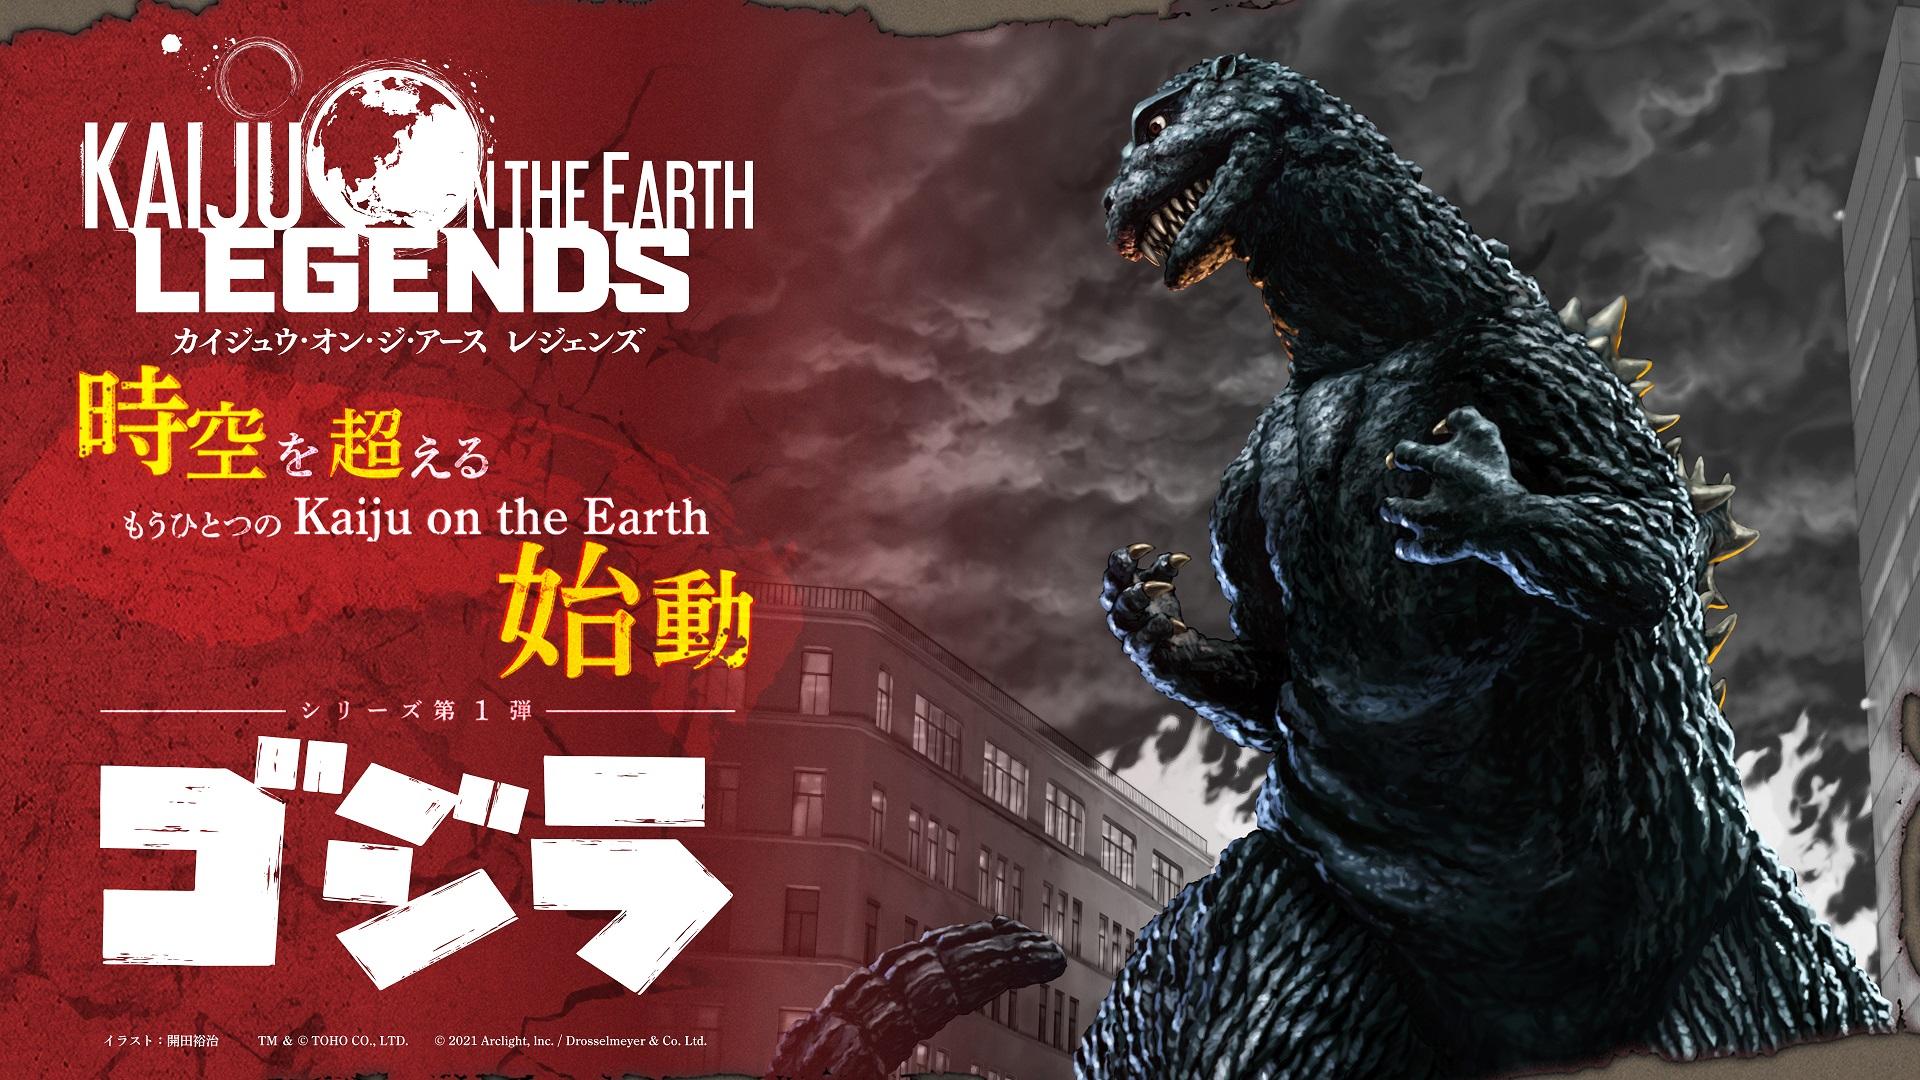 Kaiju on the Earth LEGENDS (2)